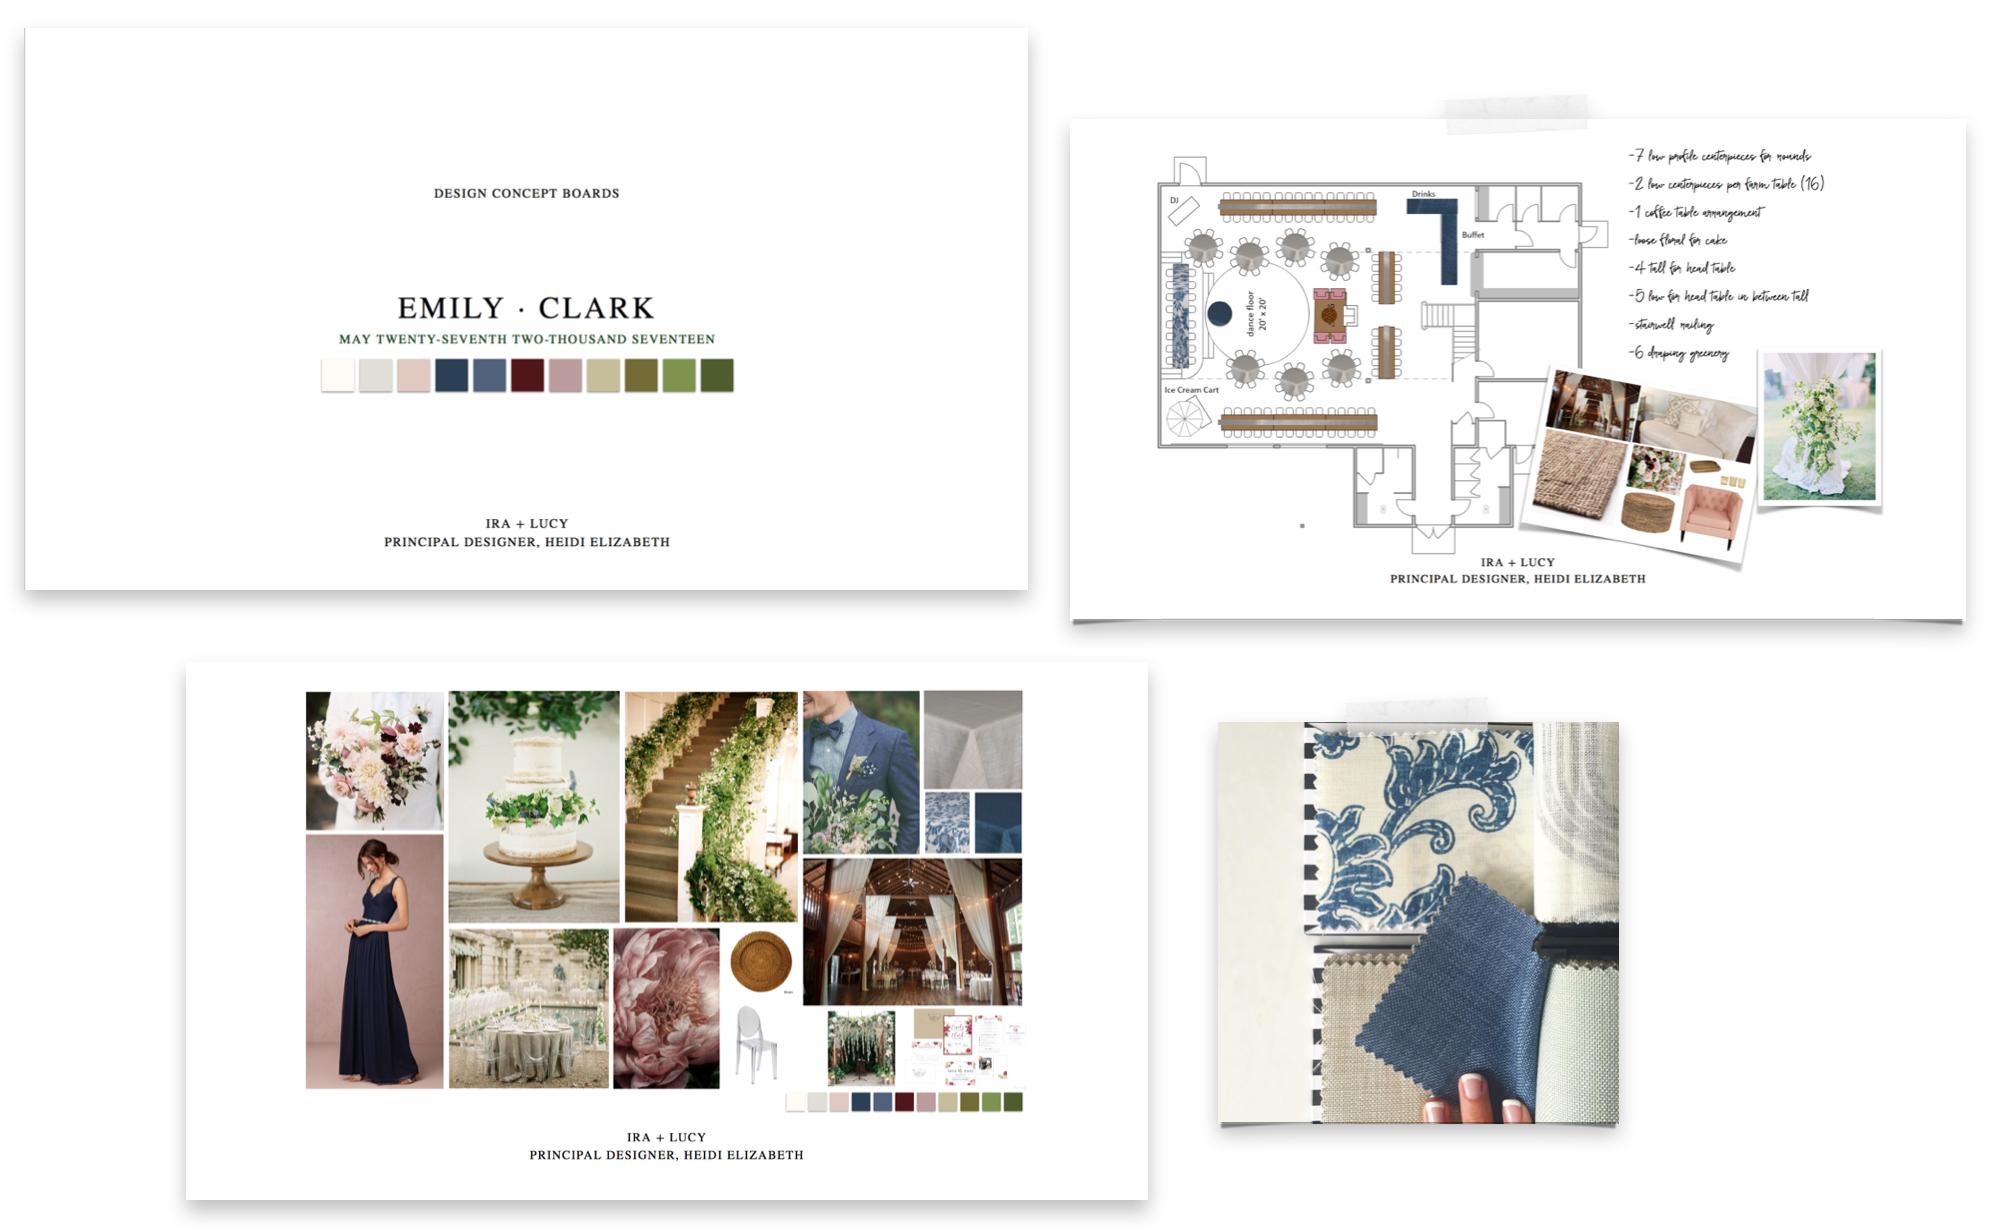 Ira and Lucy Wedding Planner, Custom Design Boards